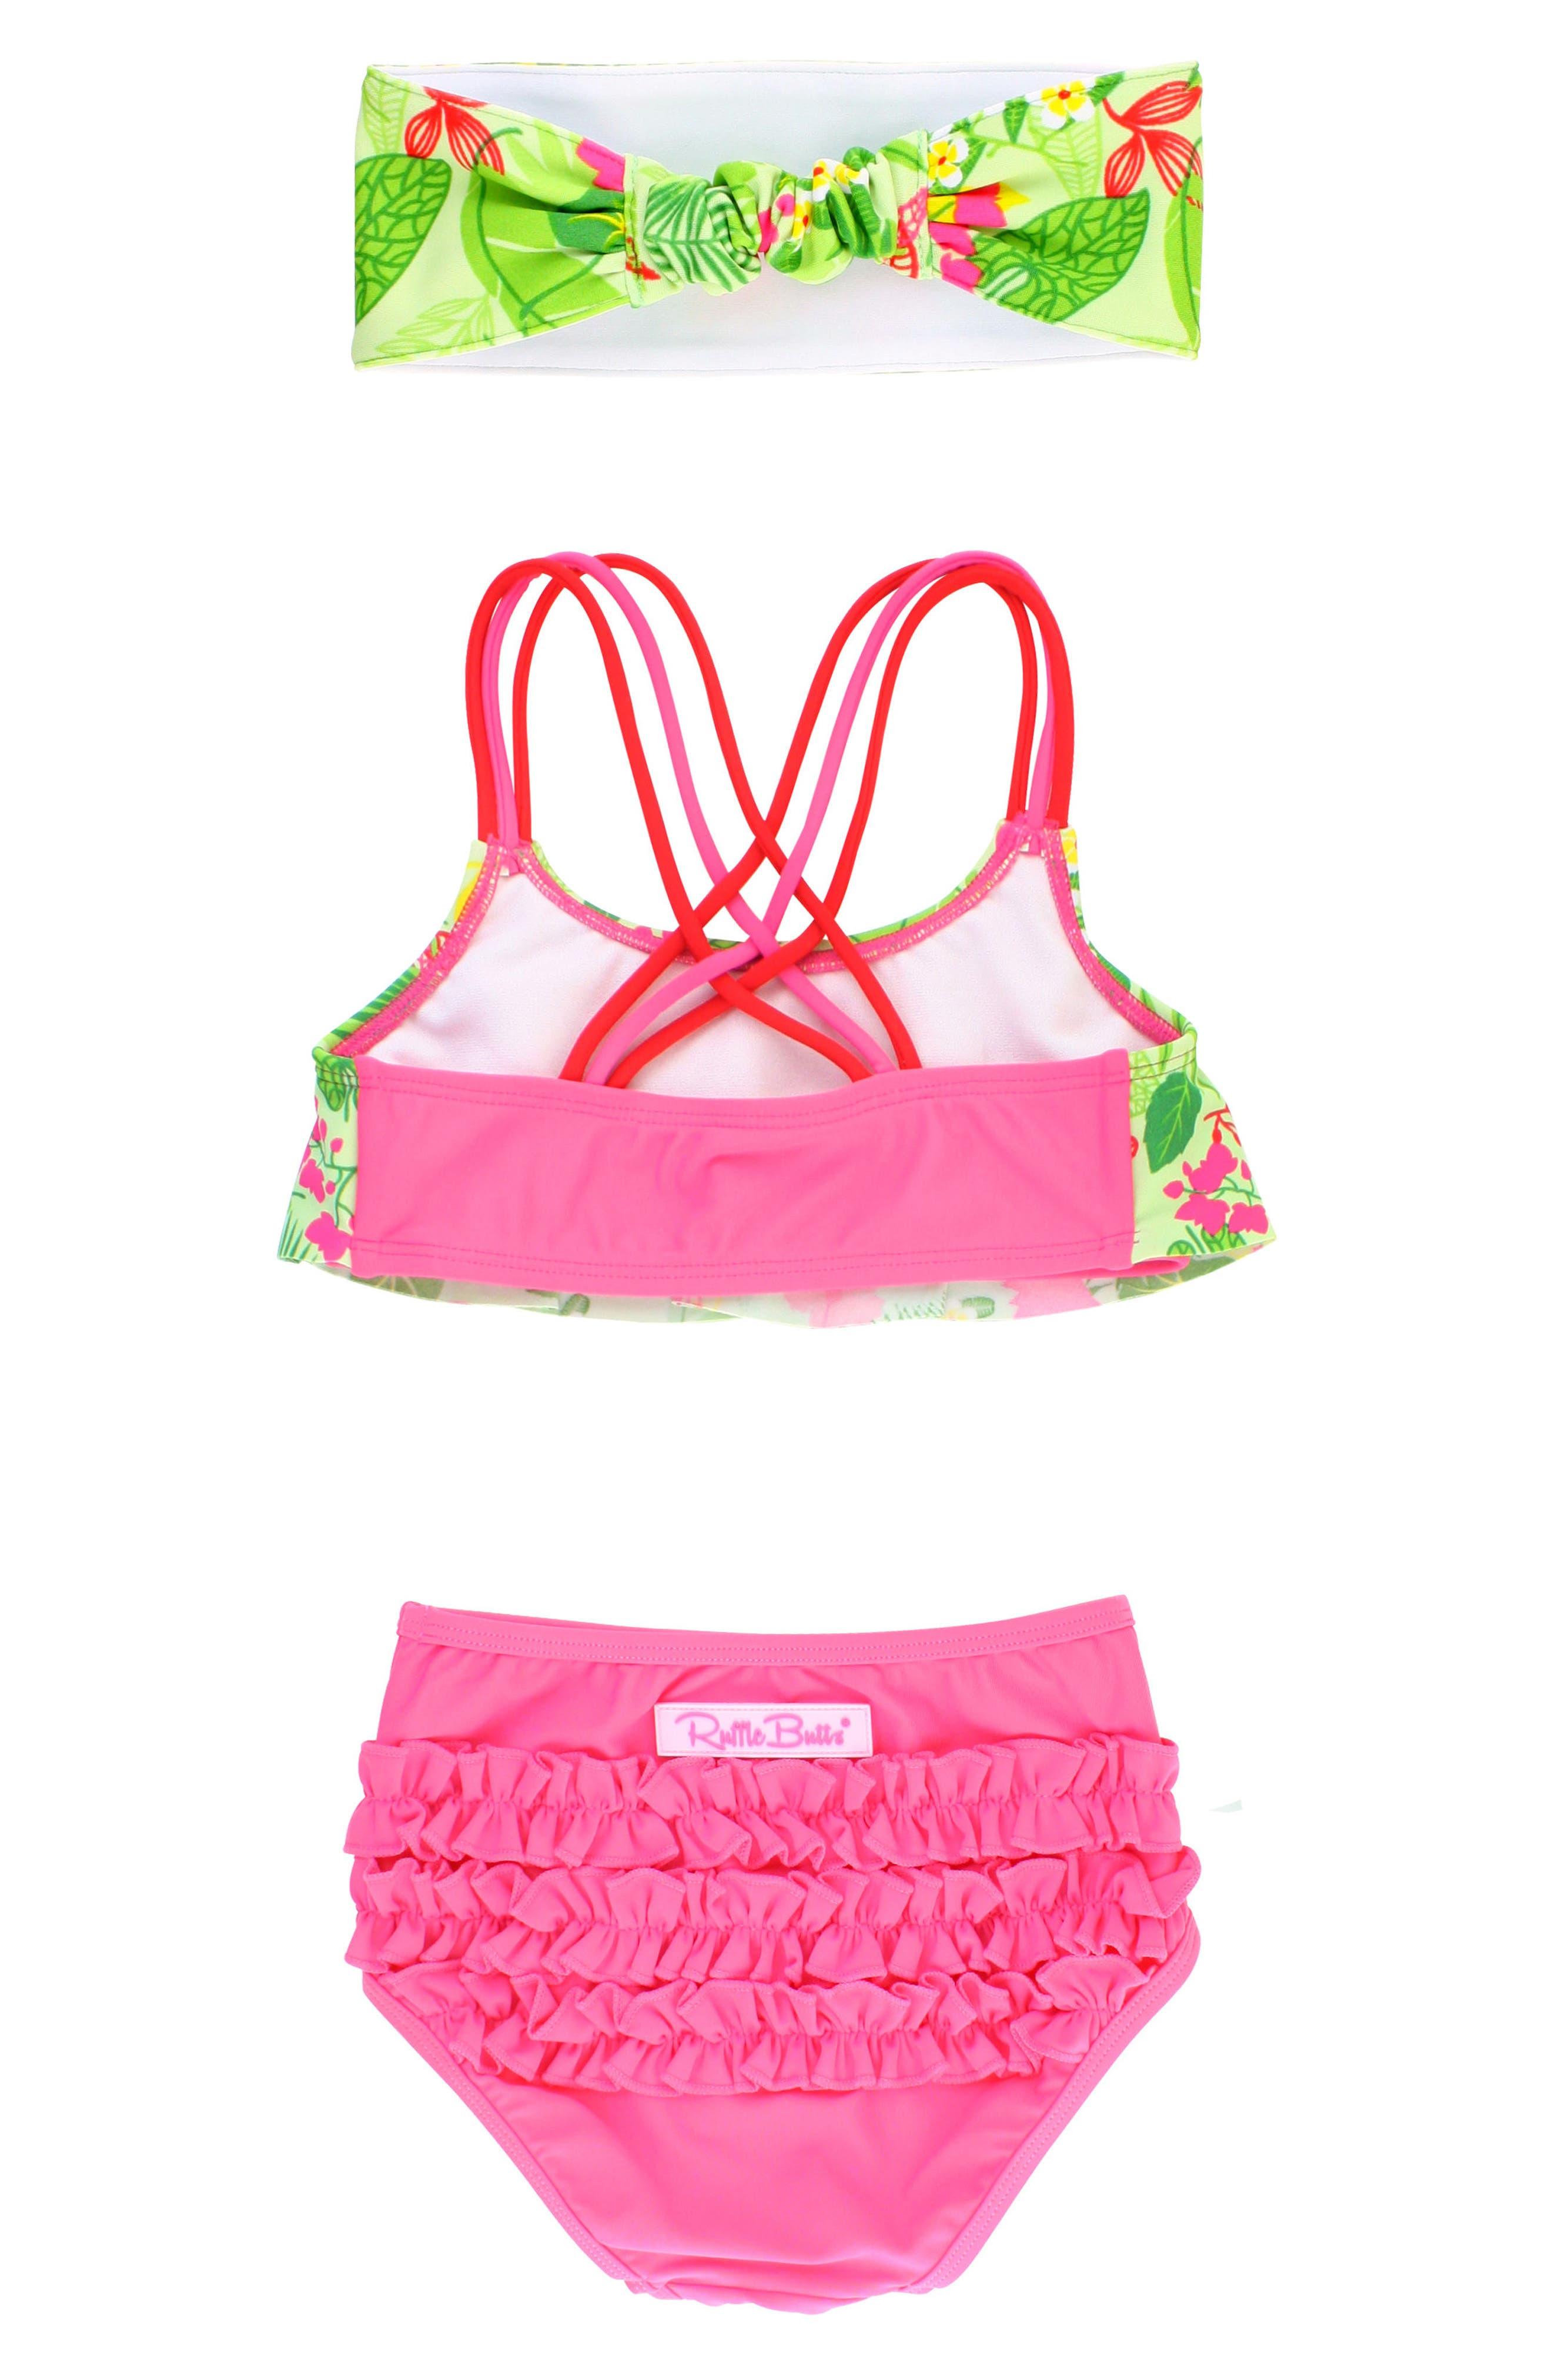 Tropical Two-Piece Swimsuit & Headband Set,                             Alternate thumbnail 3, color,                             320